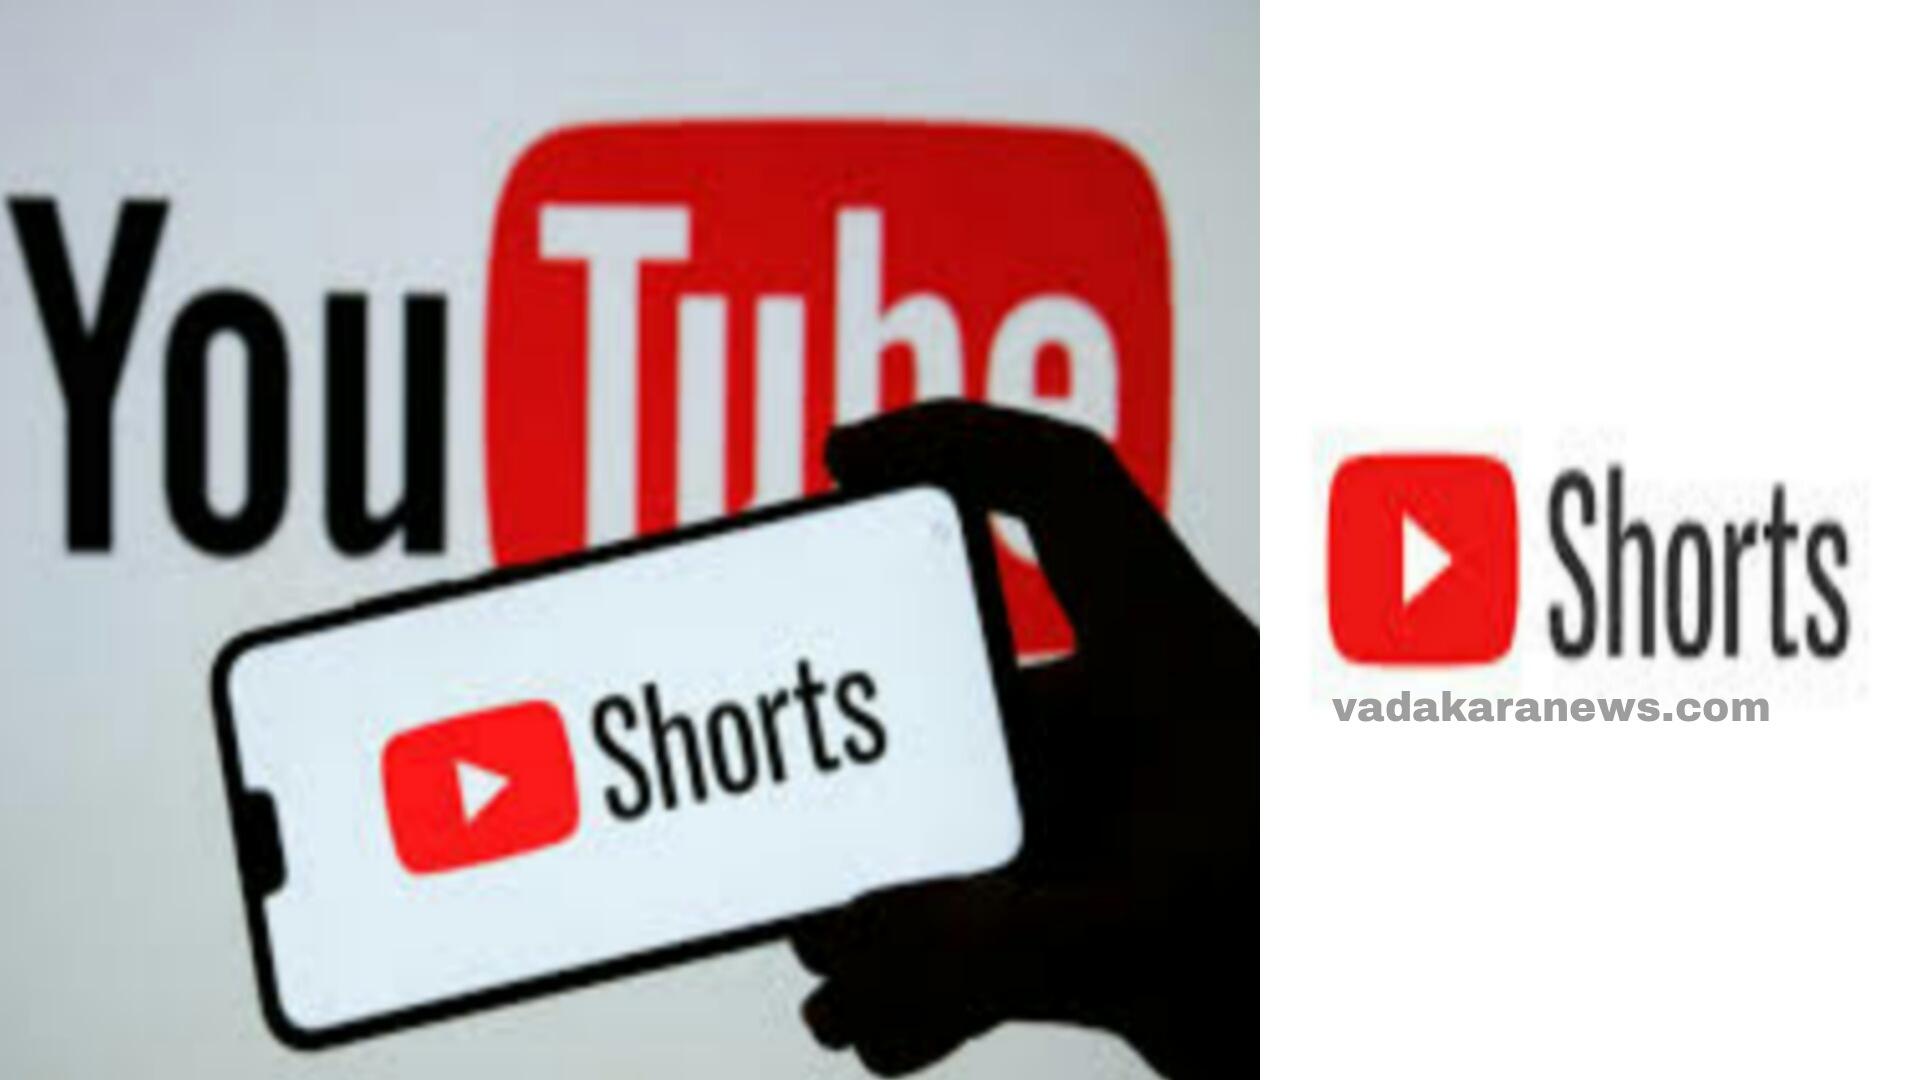 Youtube short videos